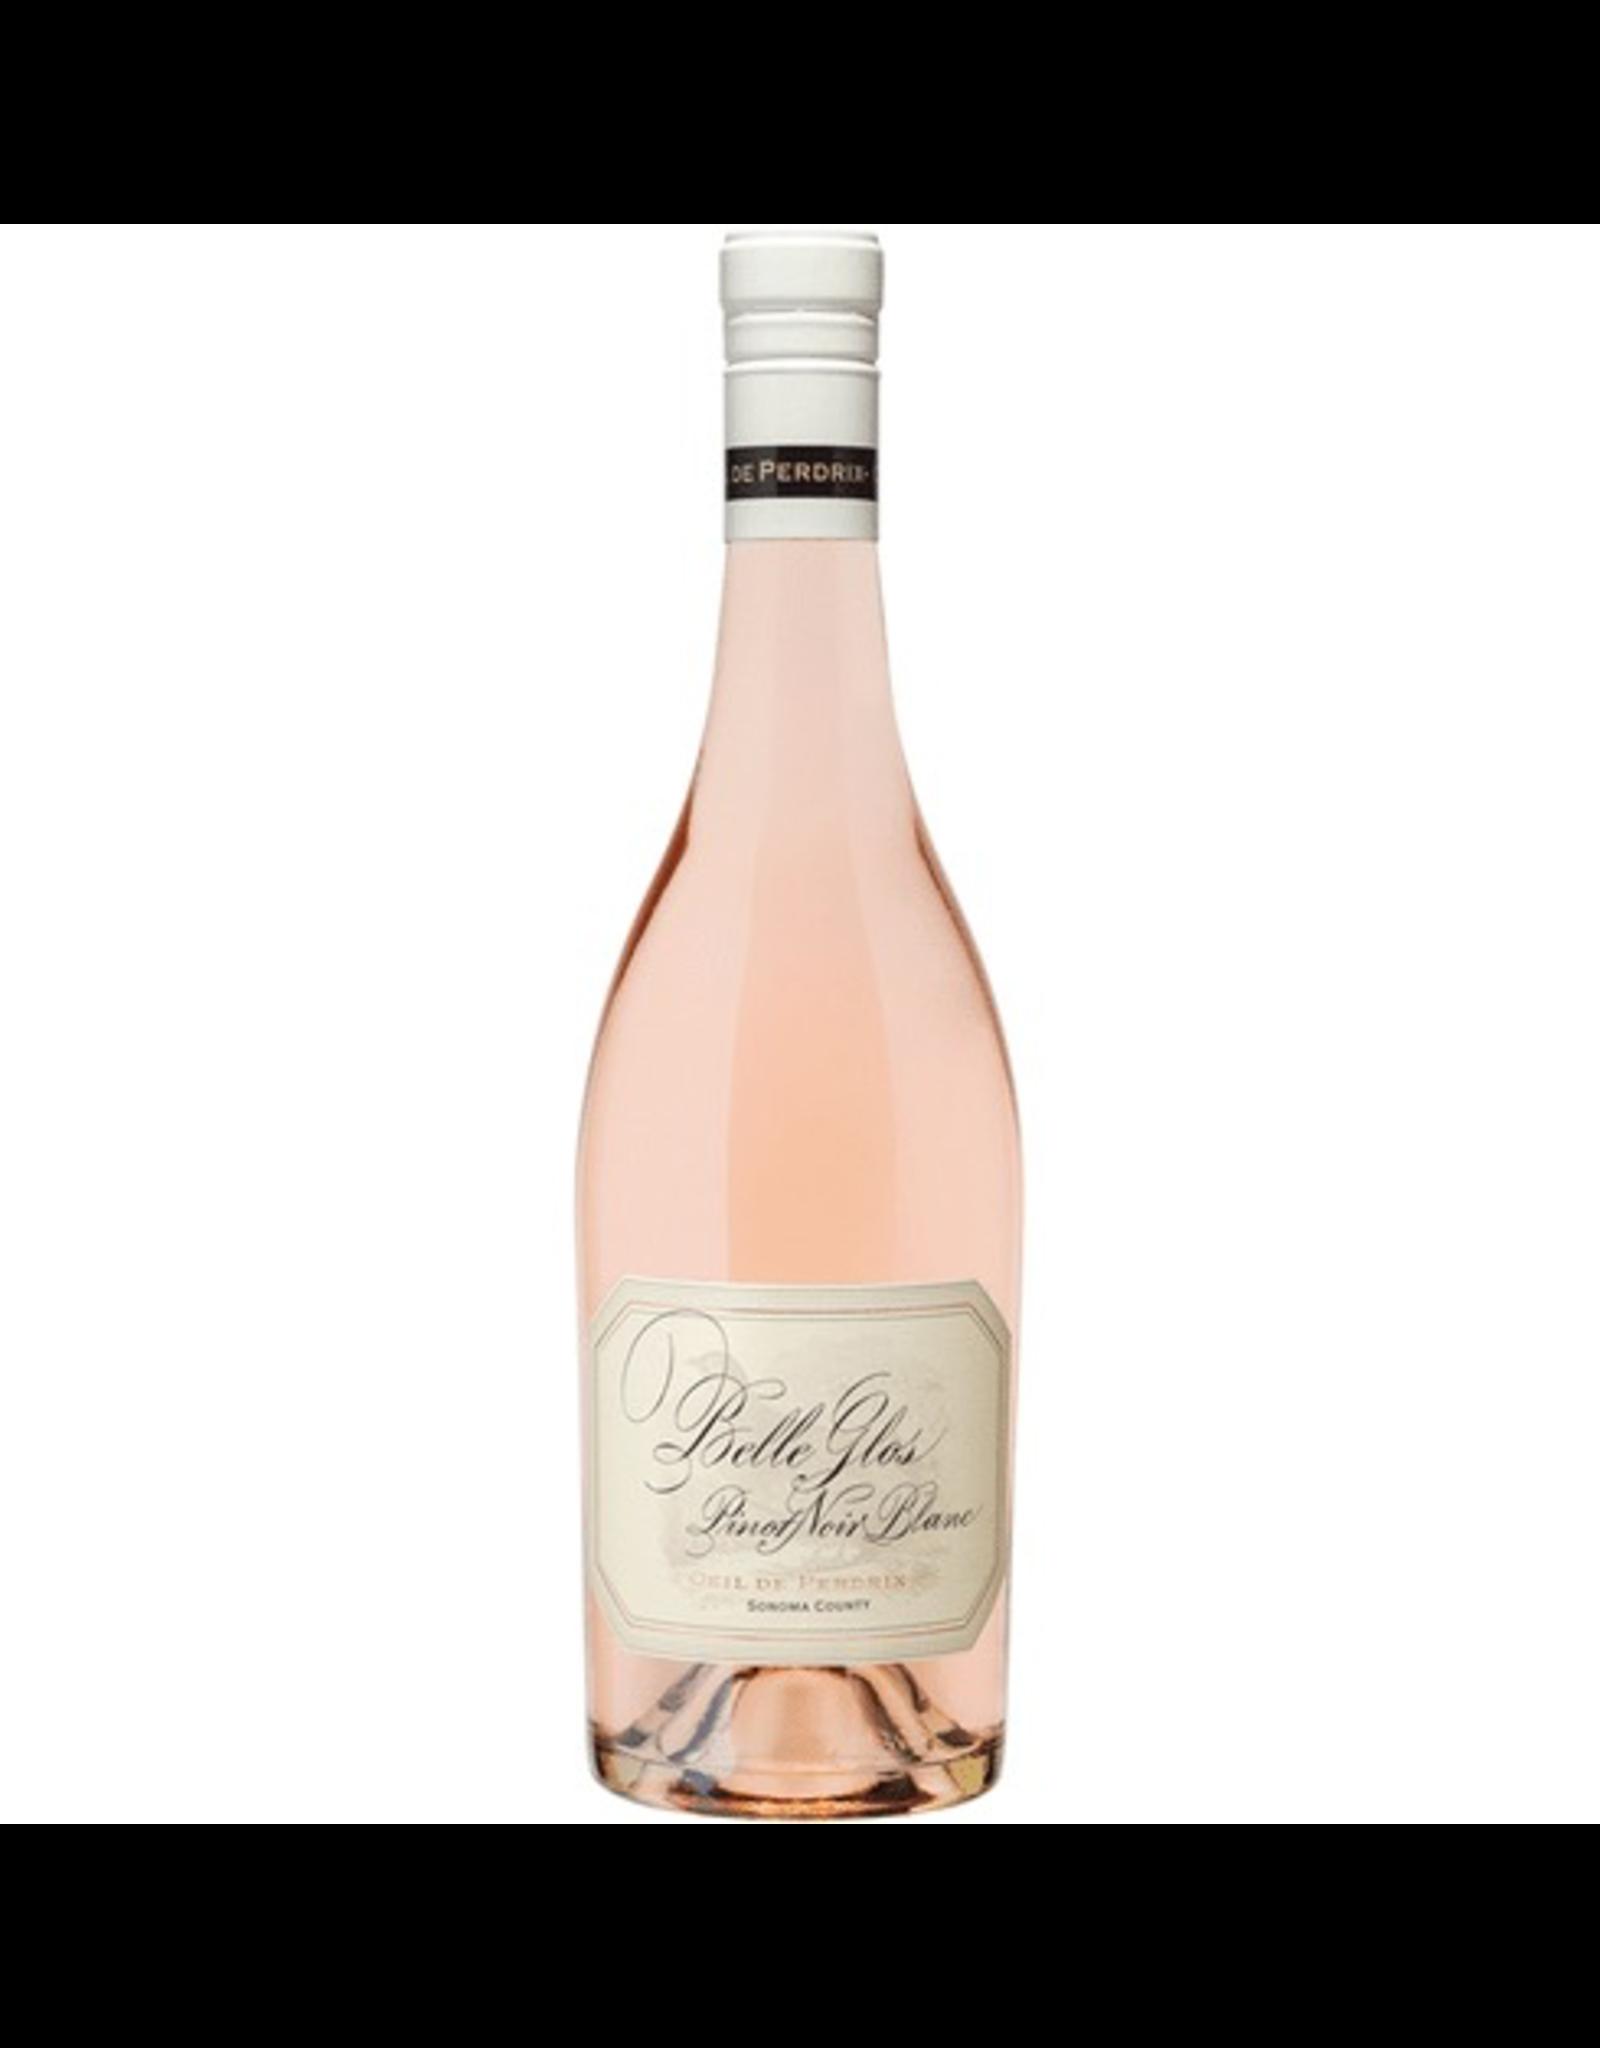 Rose Wine 2019, Belle Glos De Perdrix, Pinot Noir Blanc, California, California, USA, 14.9% Alc, CTnr